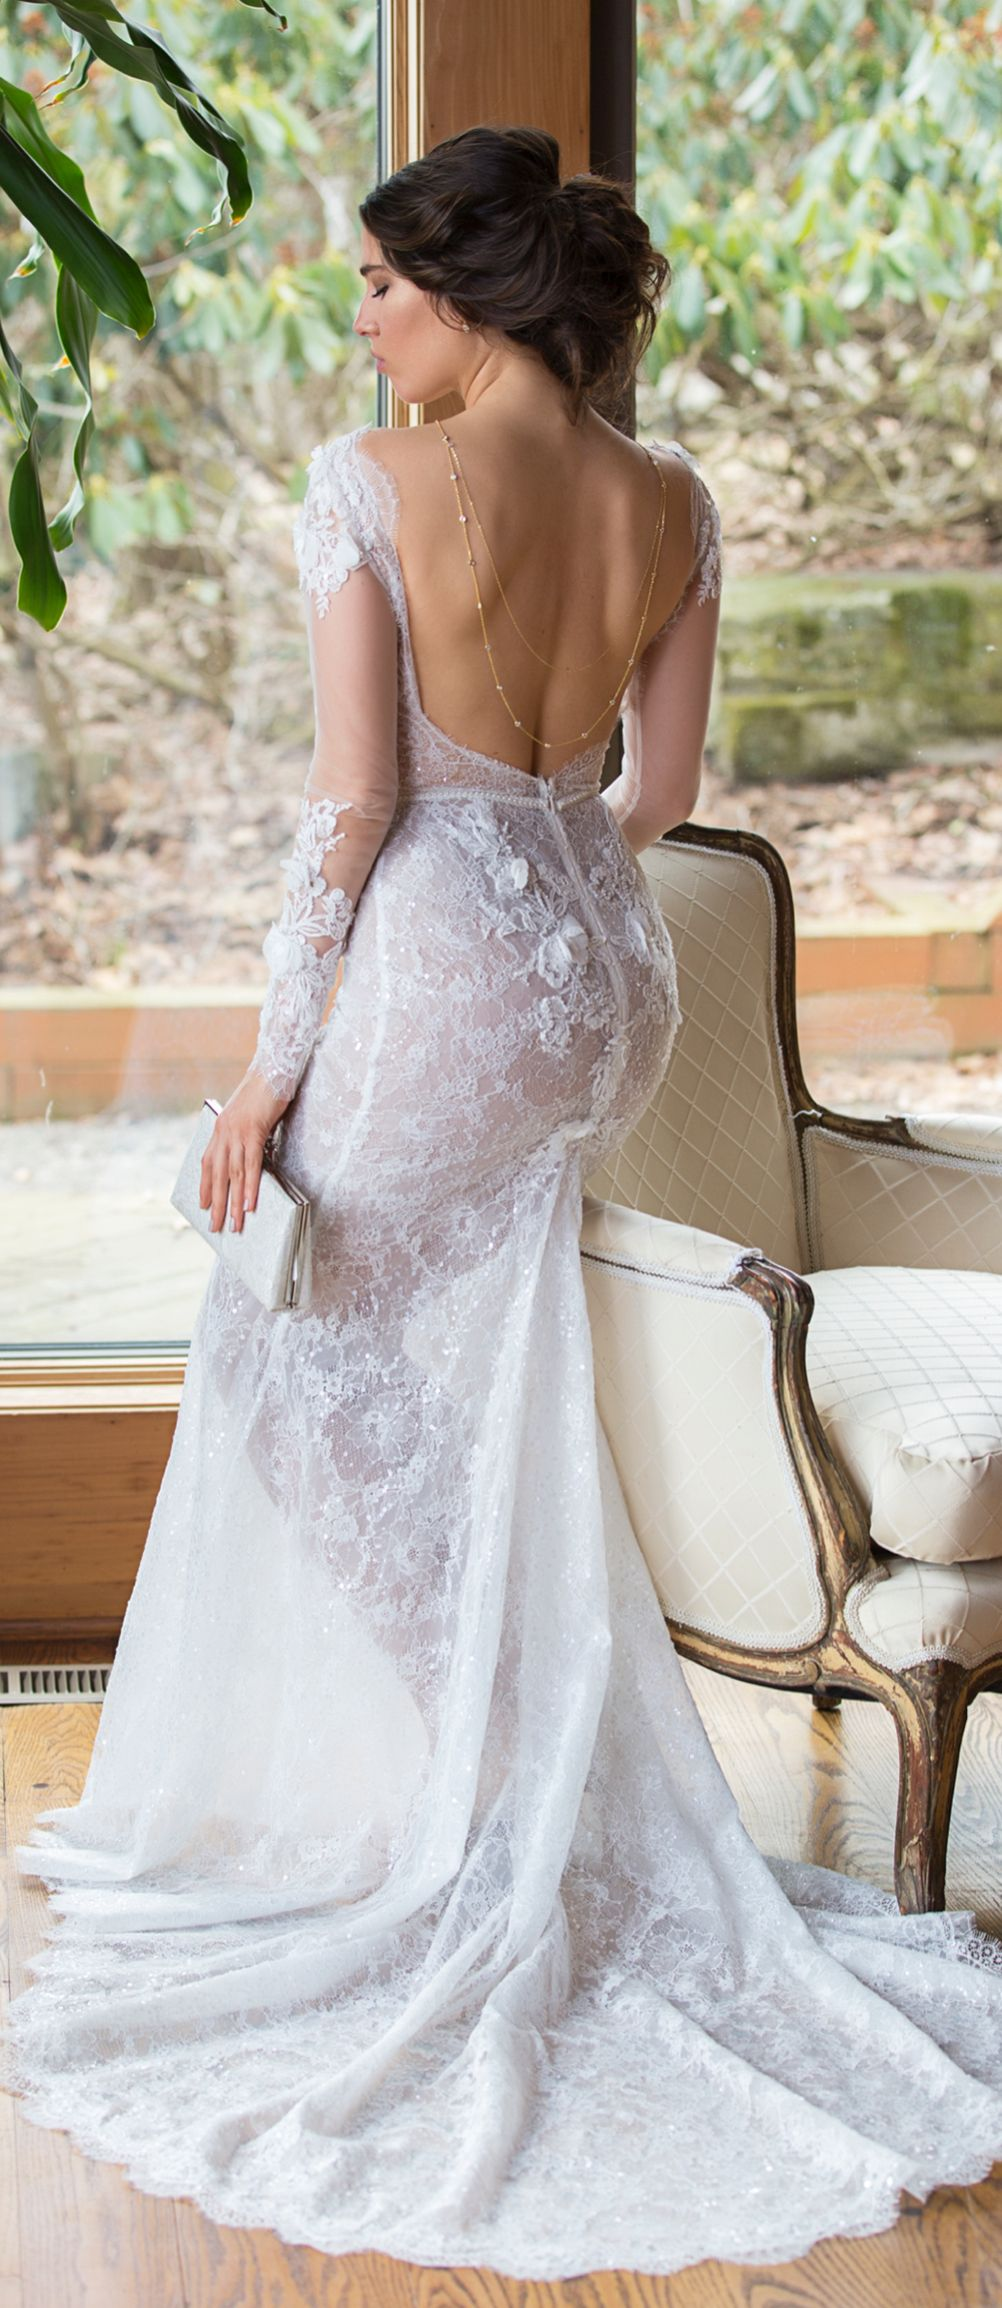 Dakota u crystal back necklace backdrops backless wedding and